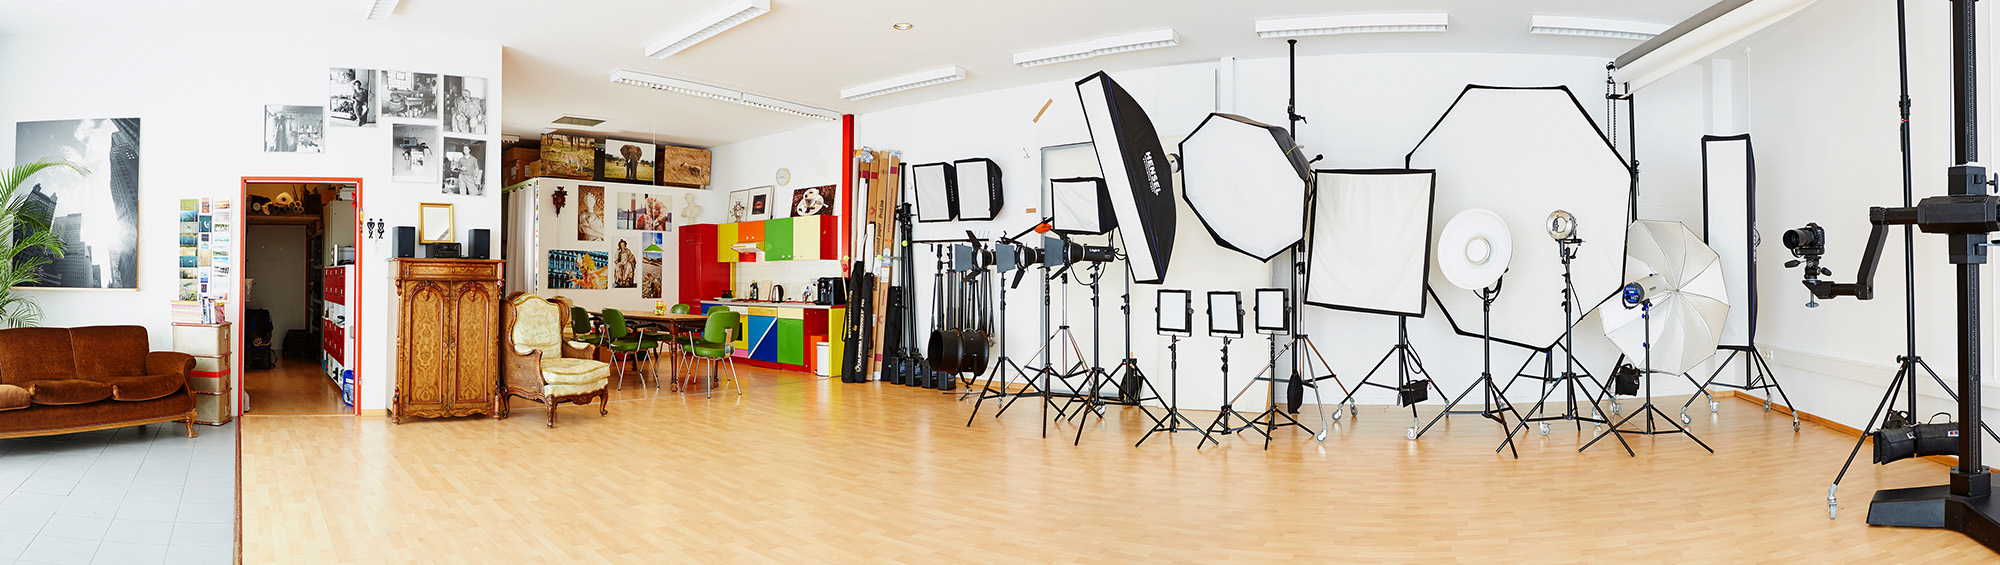 studio-b